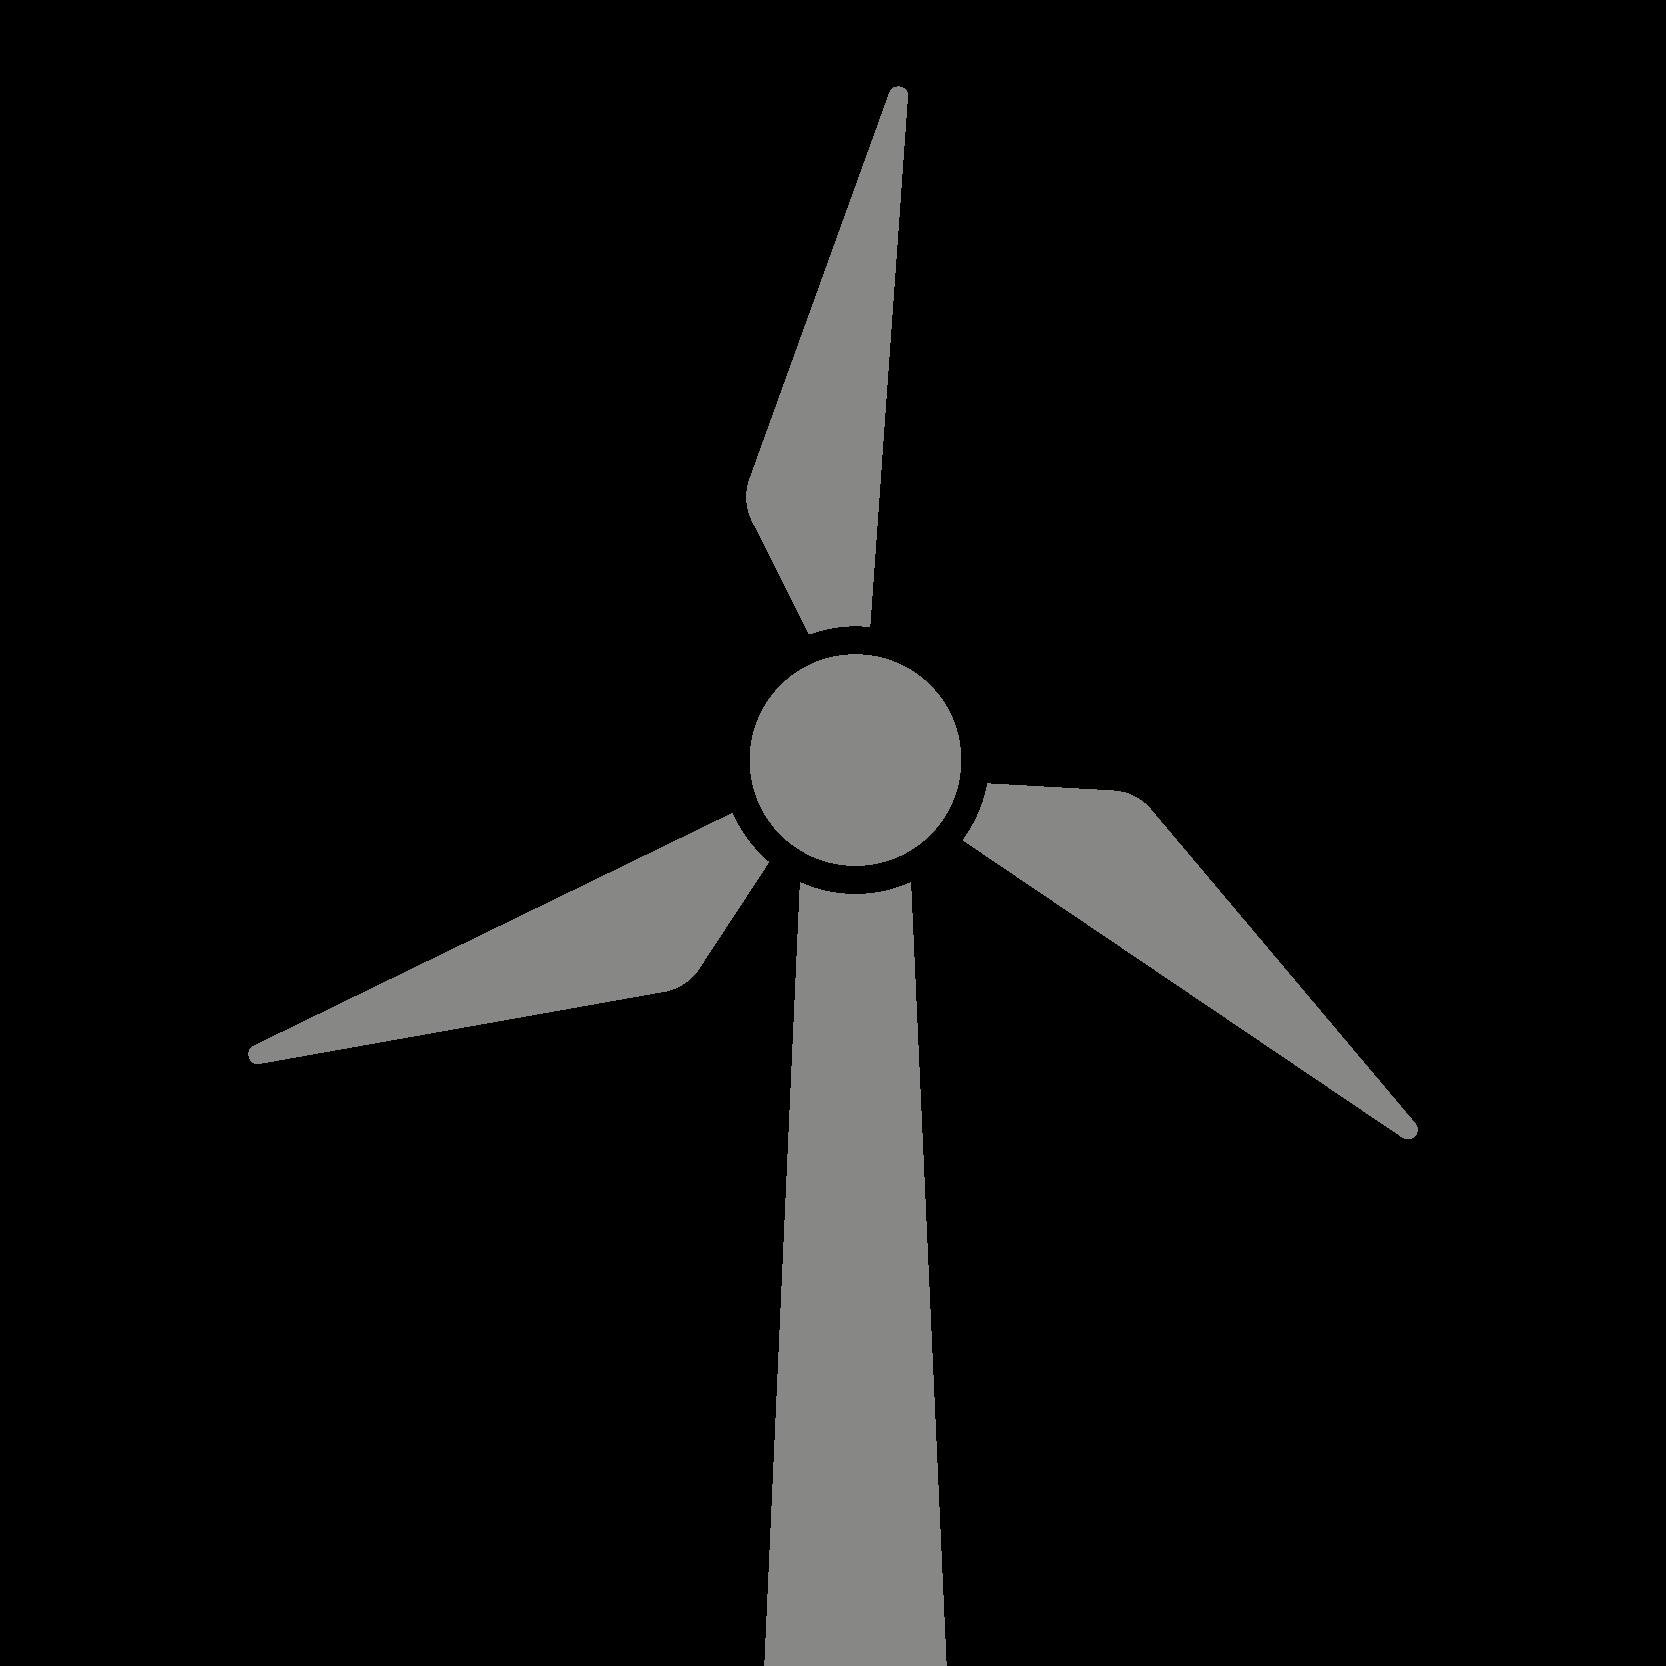 Modelo a prueba de viento